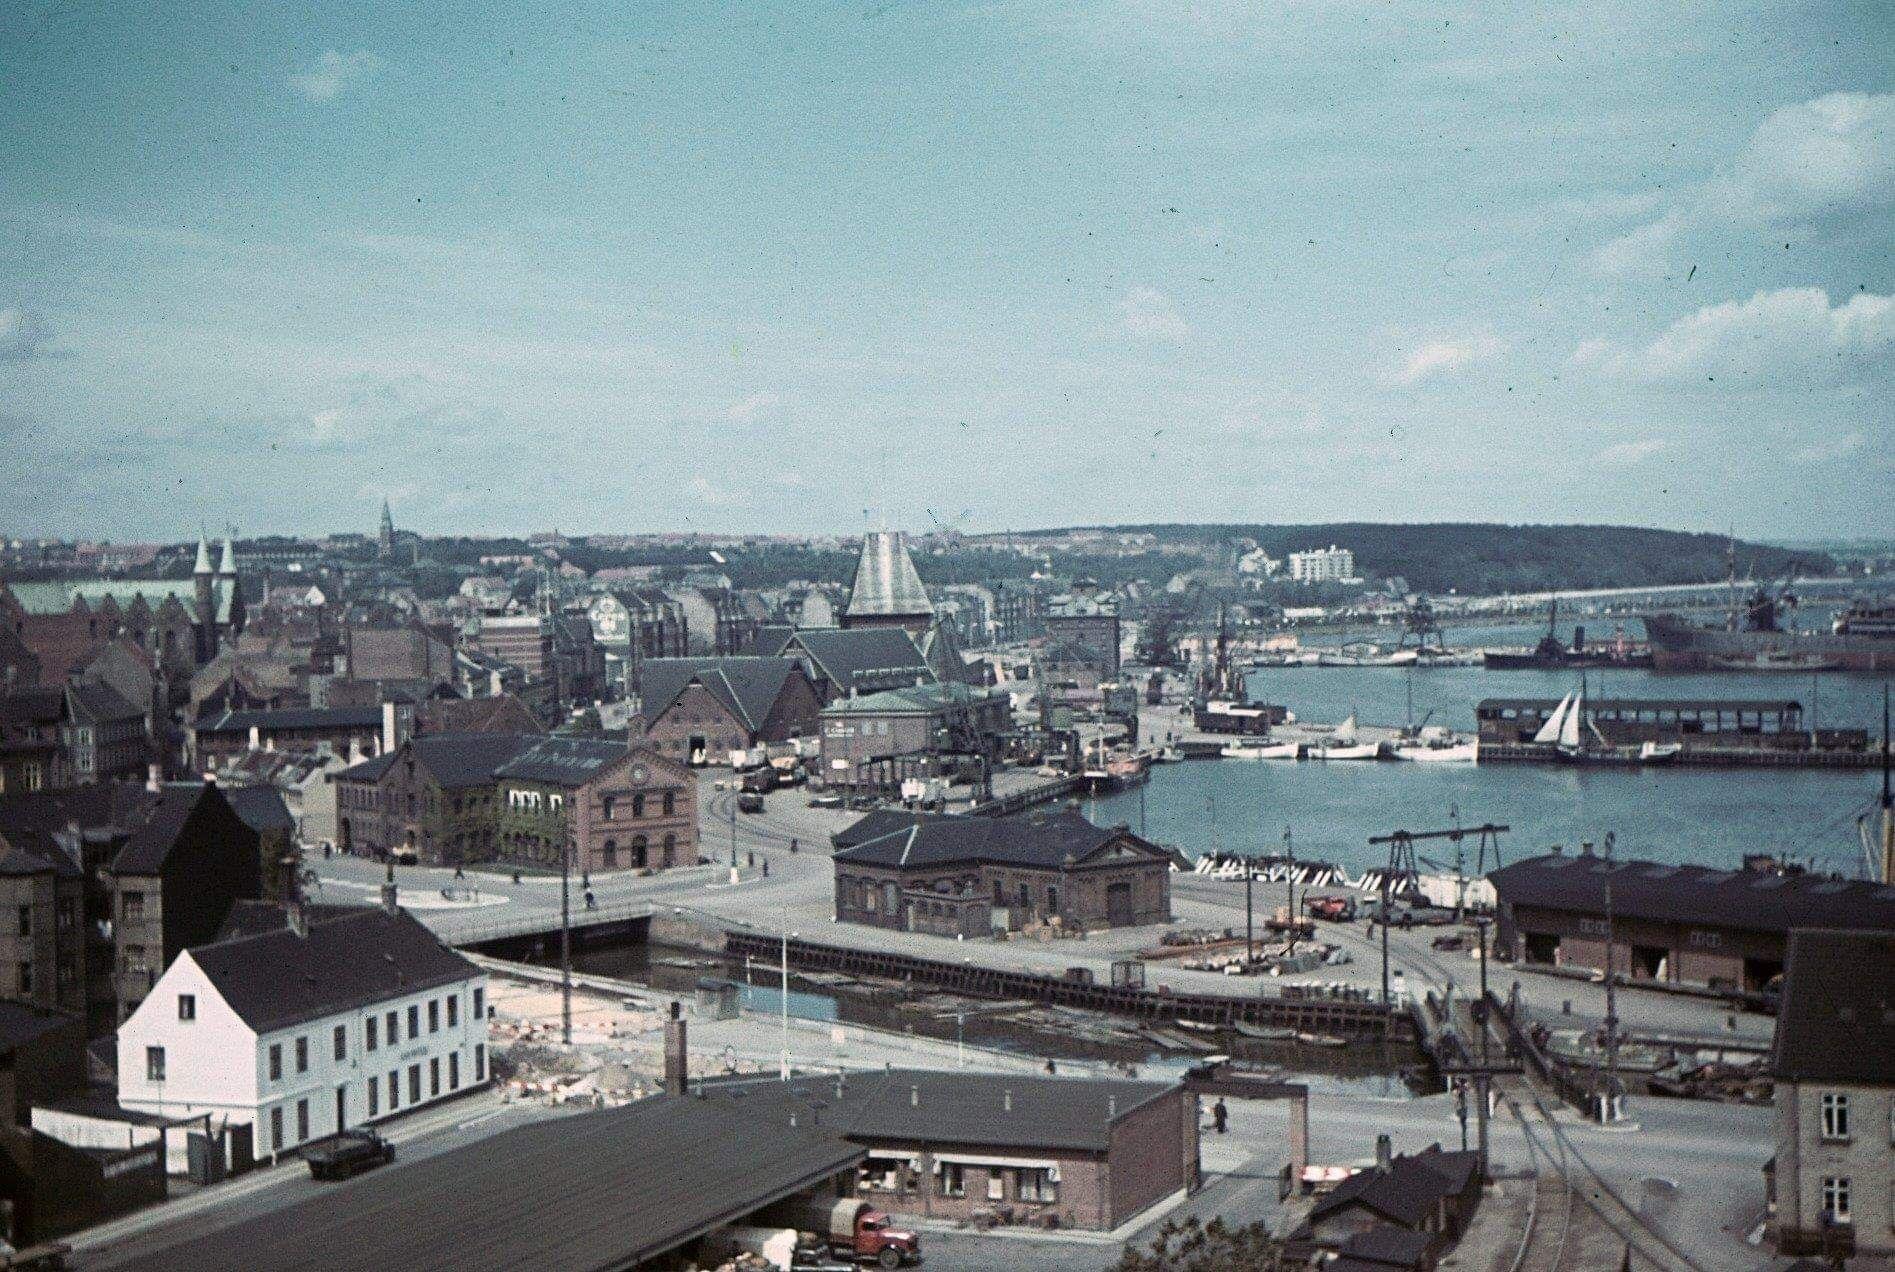 Gammelt Motiv Omkring Arhus Havn Aarhus Danmark Billeder